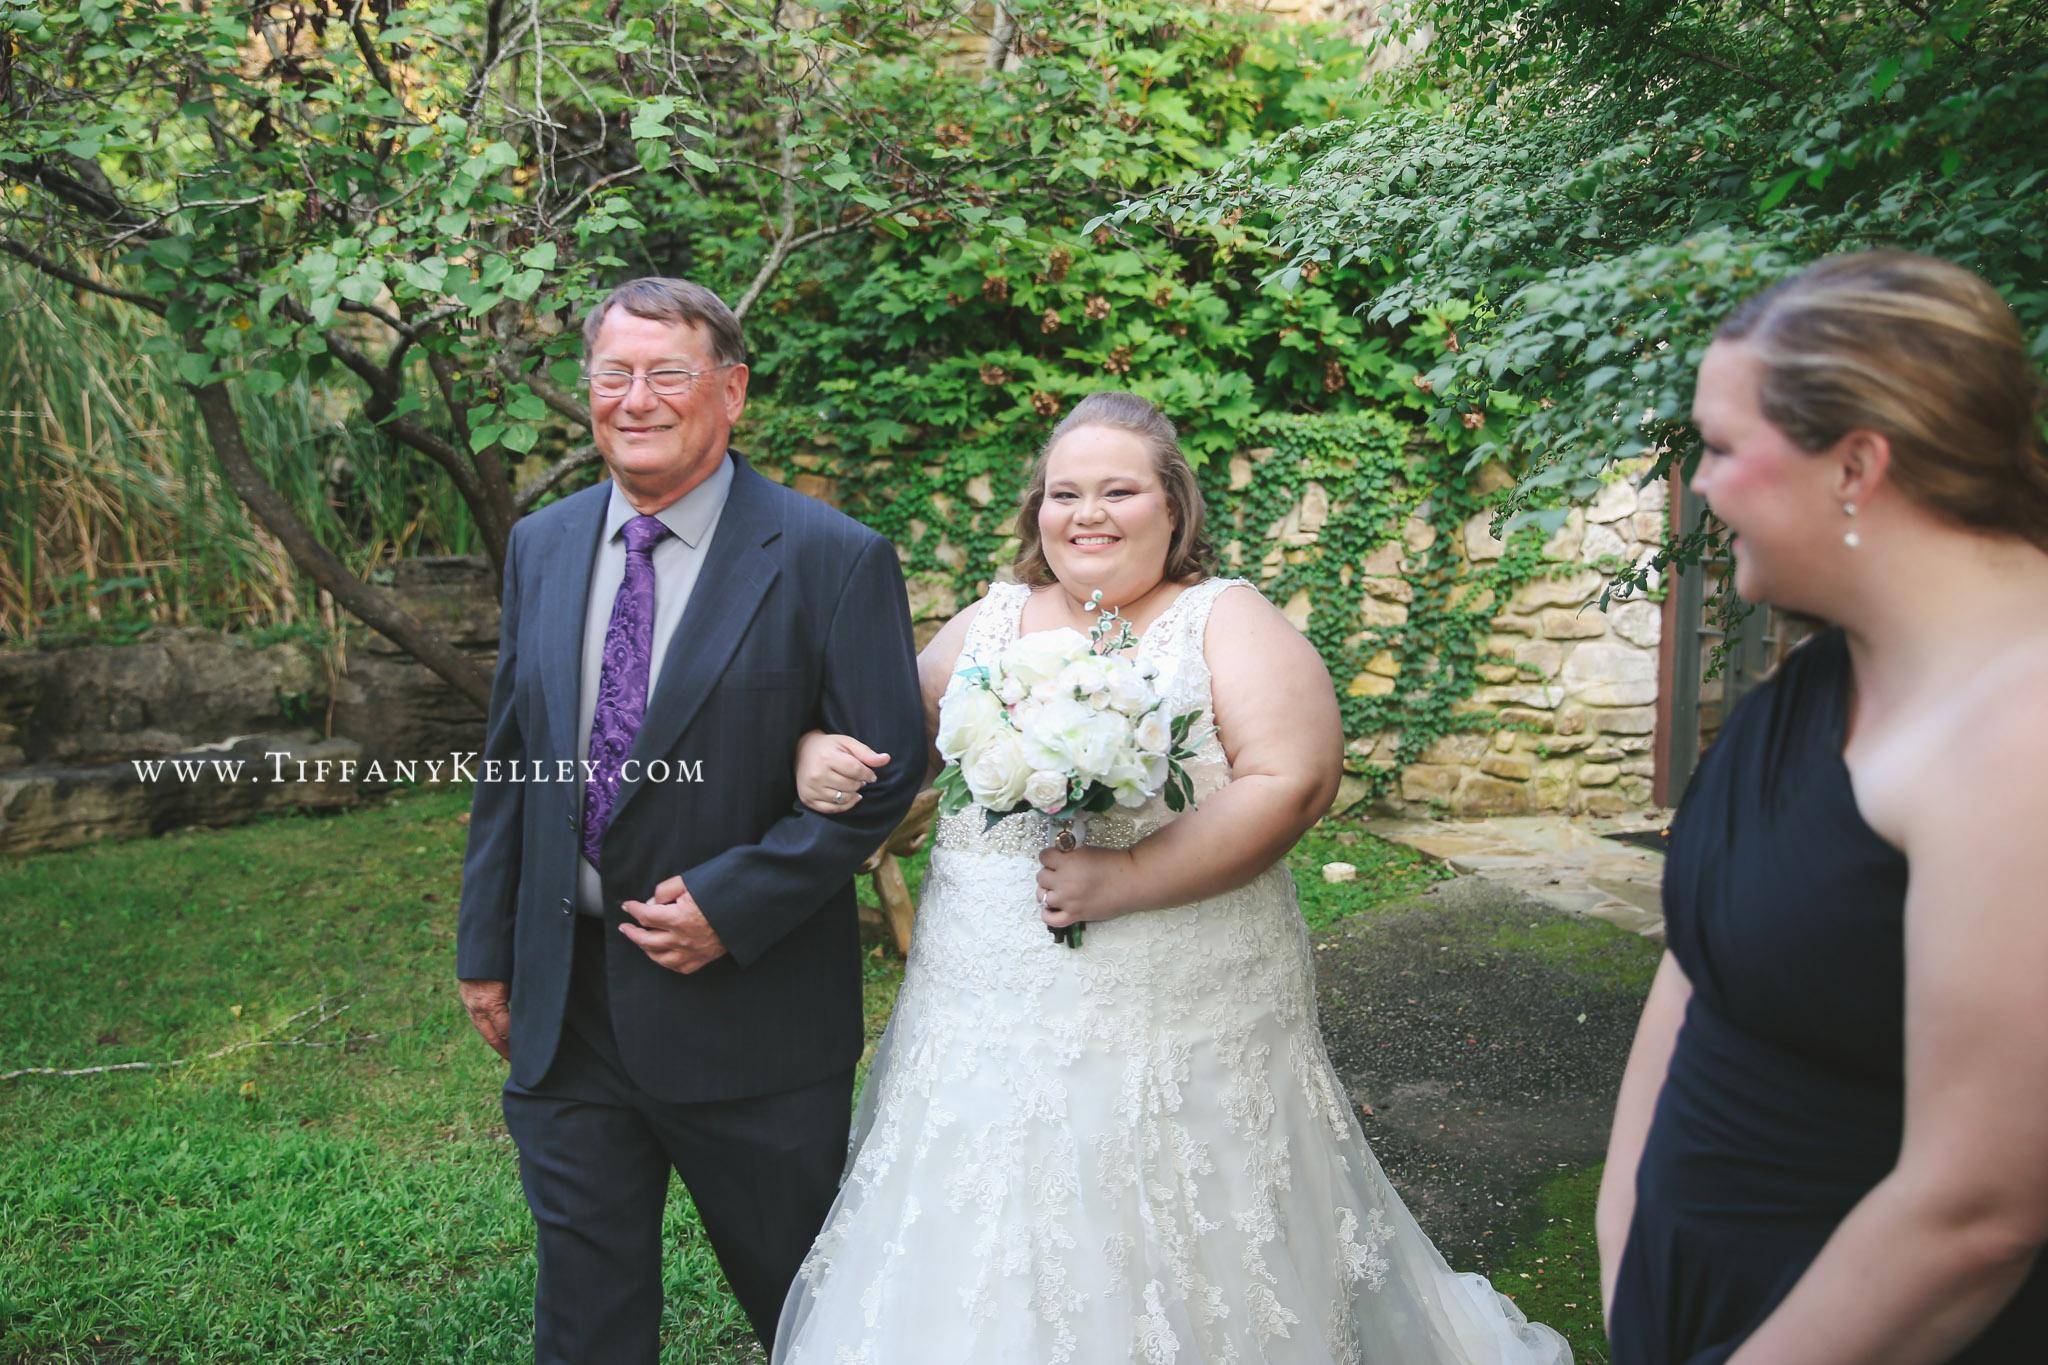 branson-missouri-big-cedar-lodge-wedding-photographer-tiffany-kelley-photography-02